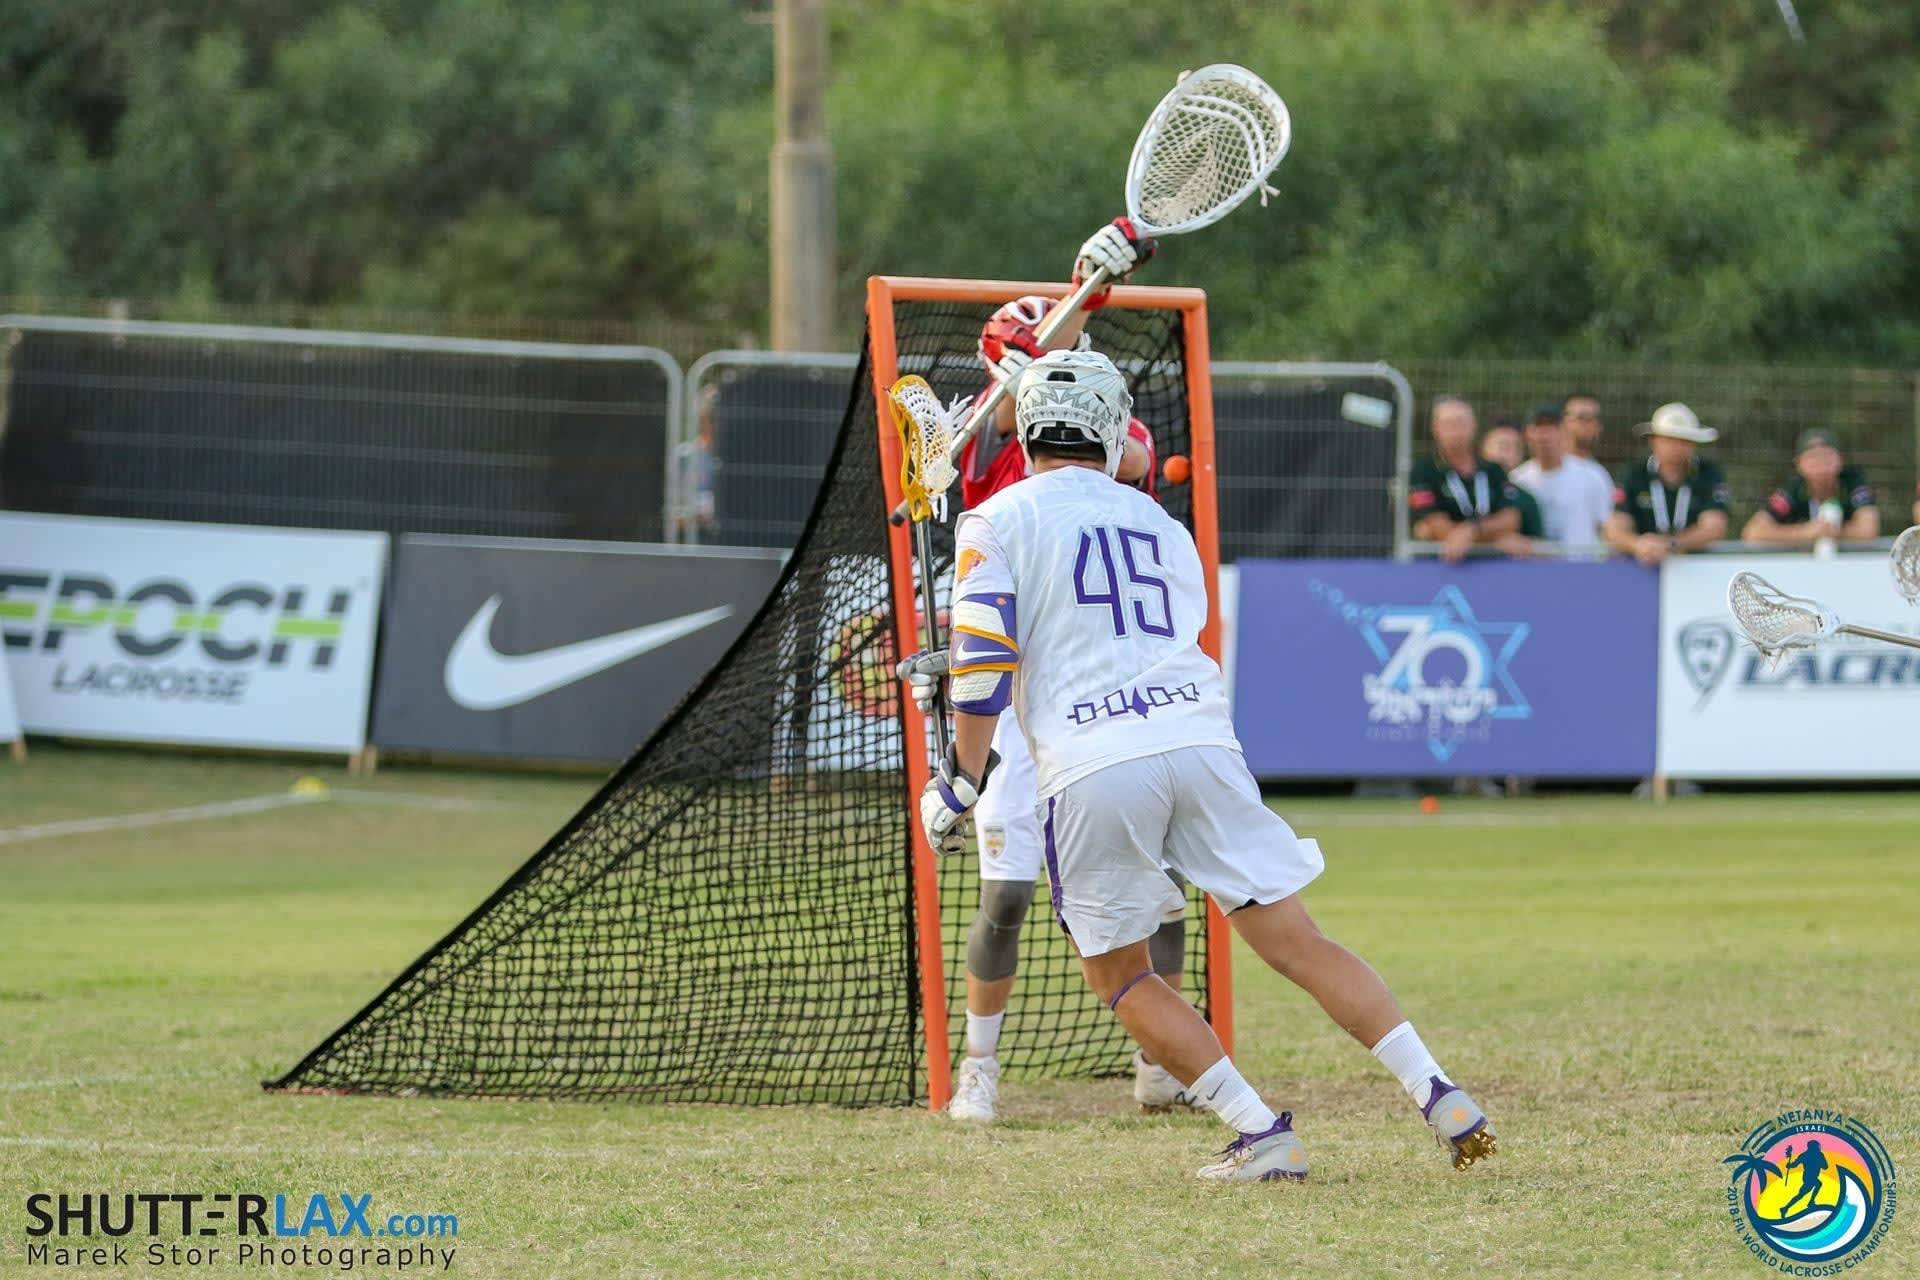 England Iroquois Nationals 2018 World Lacrosse Championship world championships Marek Stor Shutteralx.com